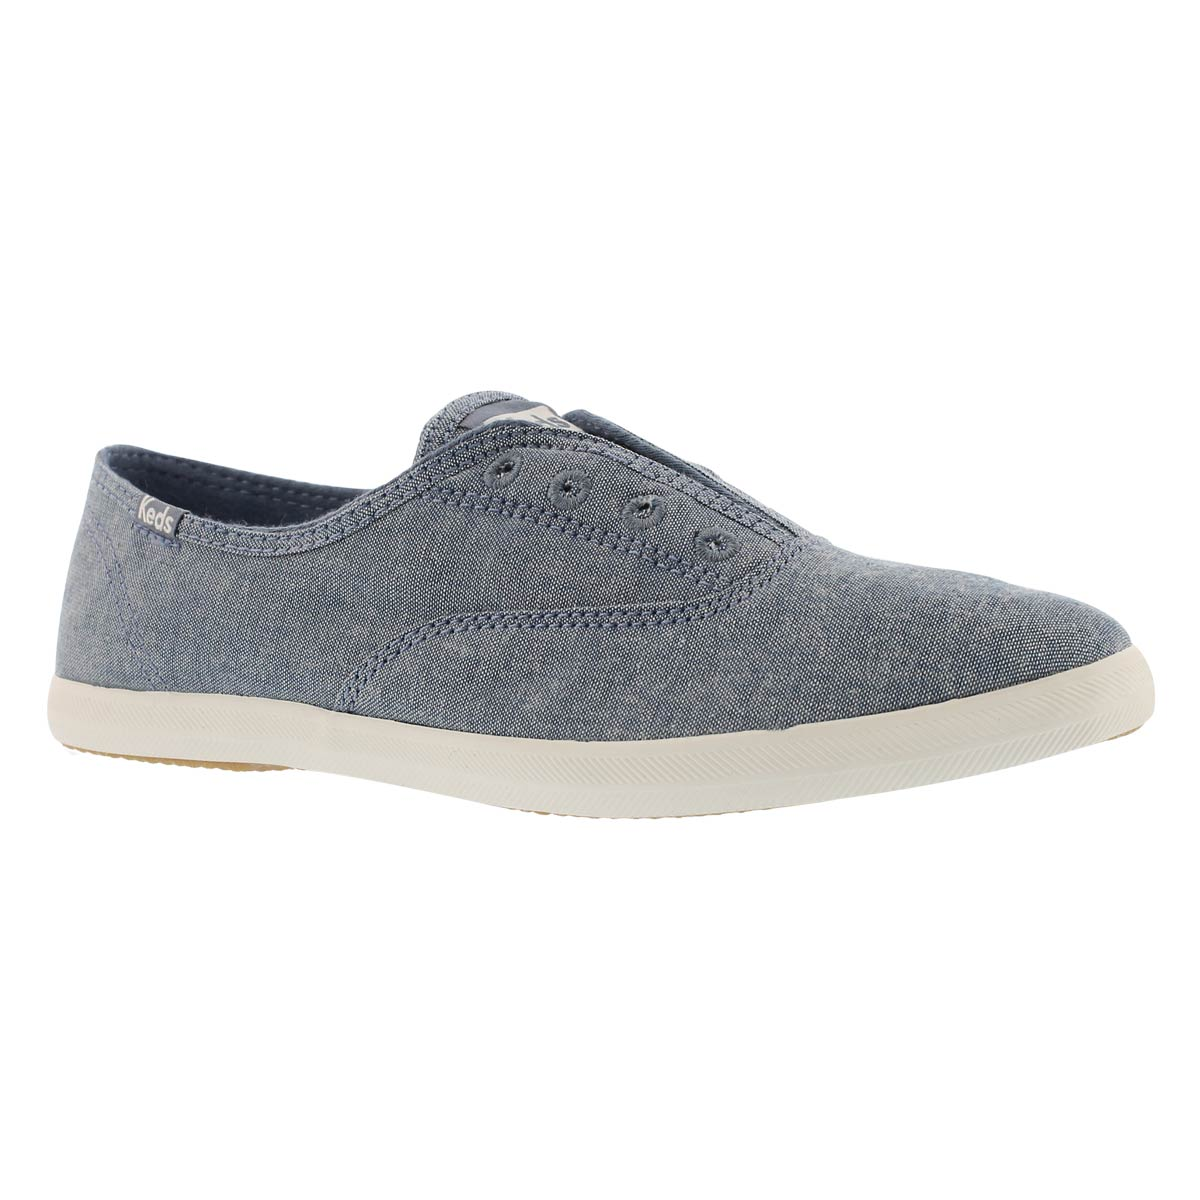 Women's CHILLAX dark blue slip on sneakers